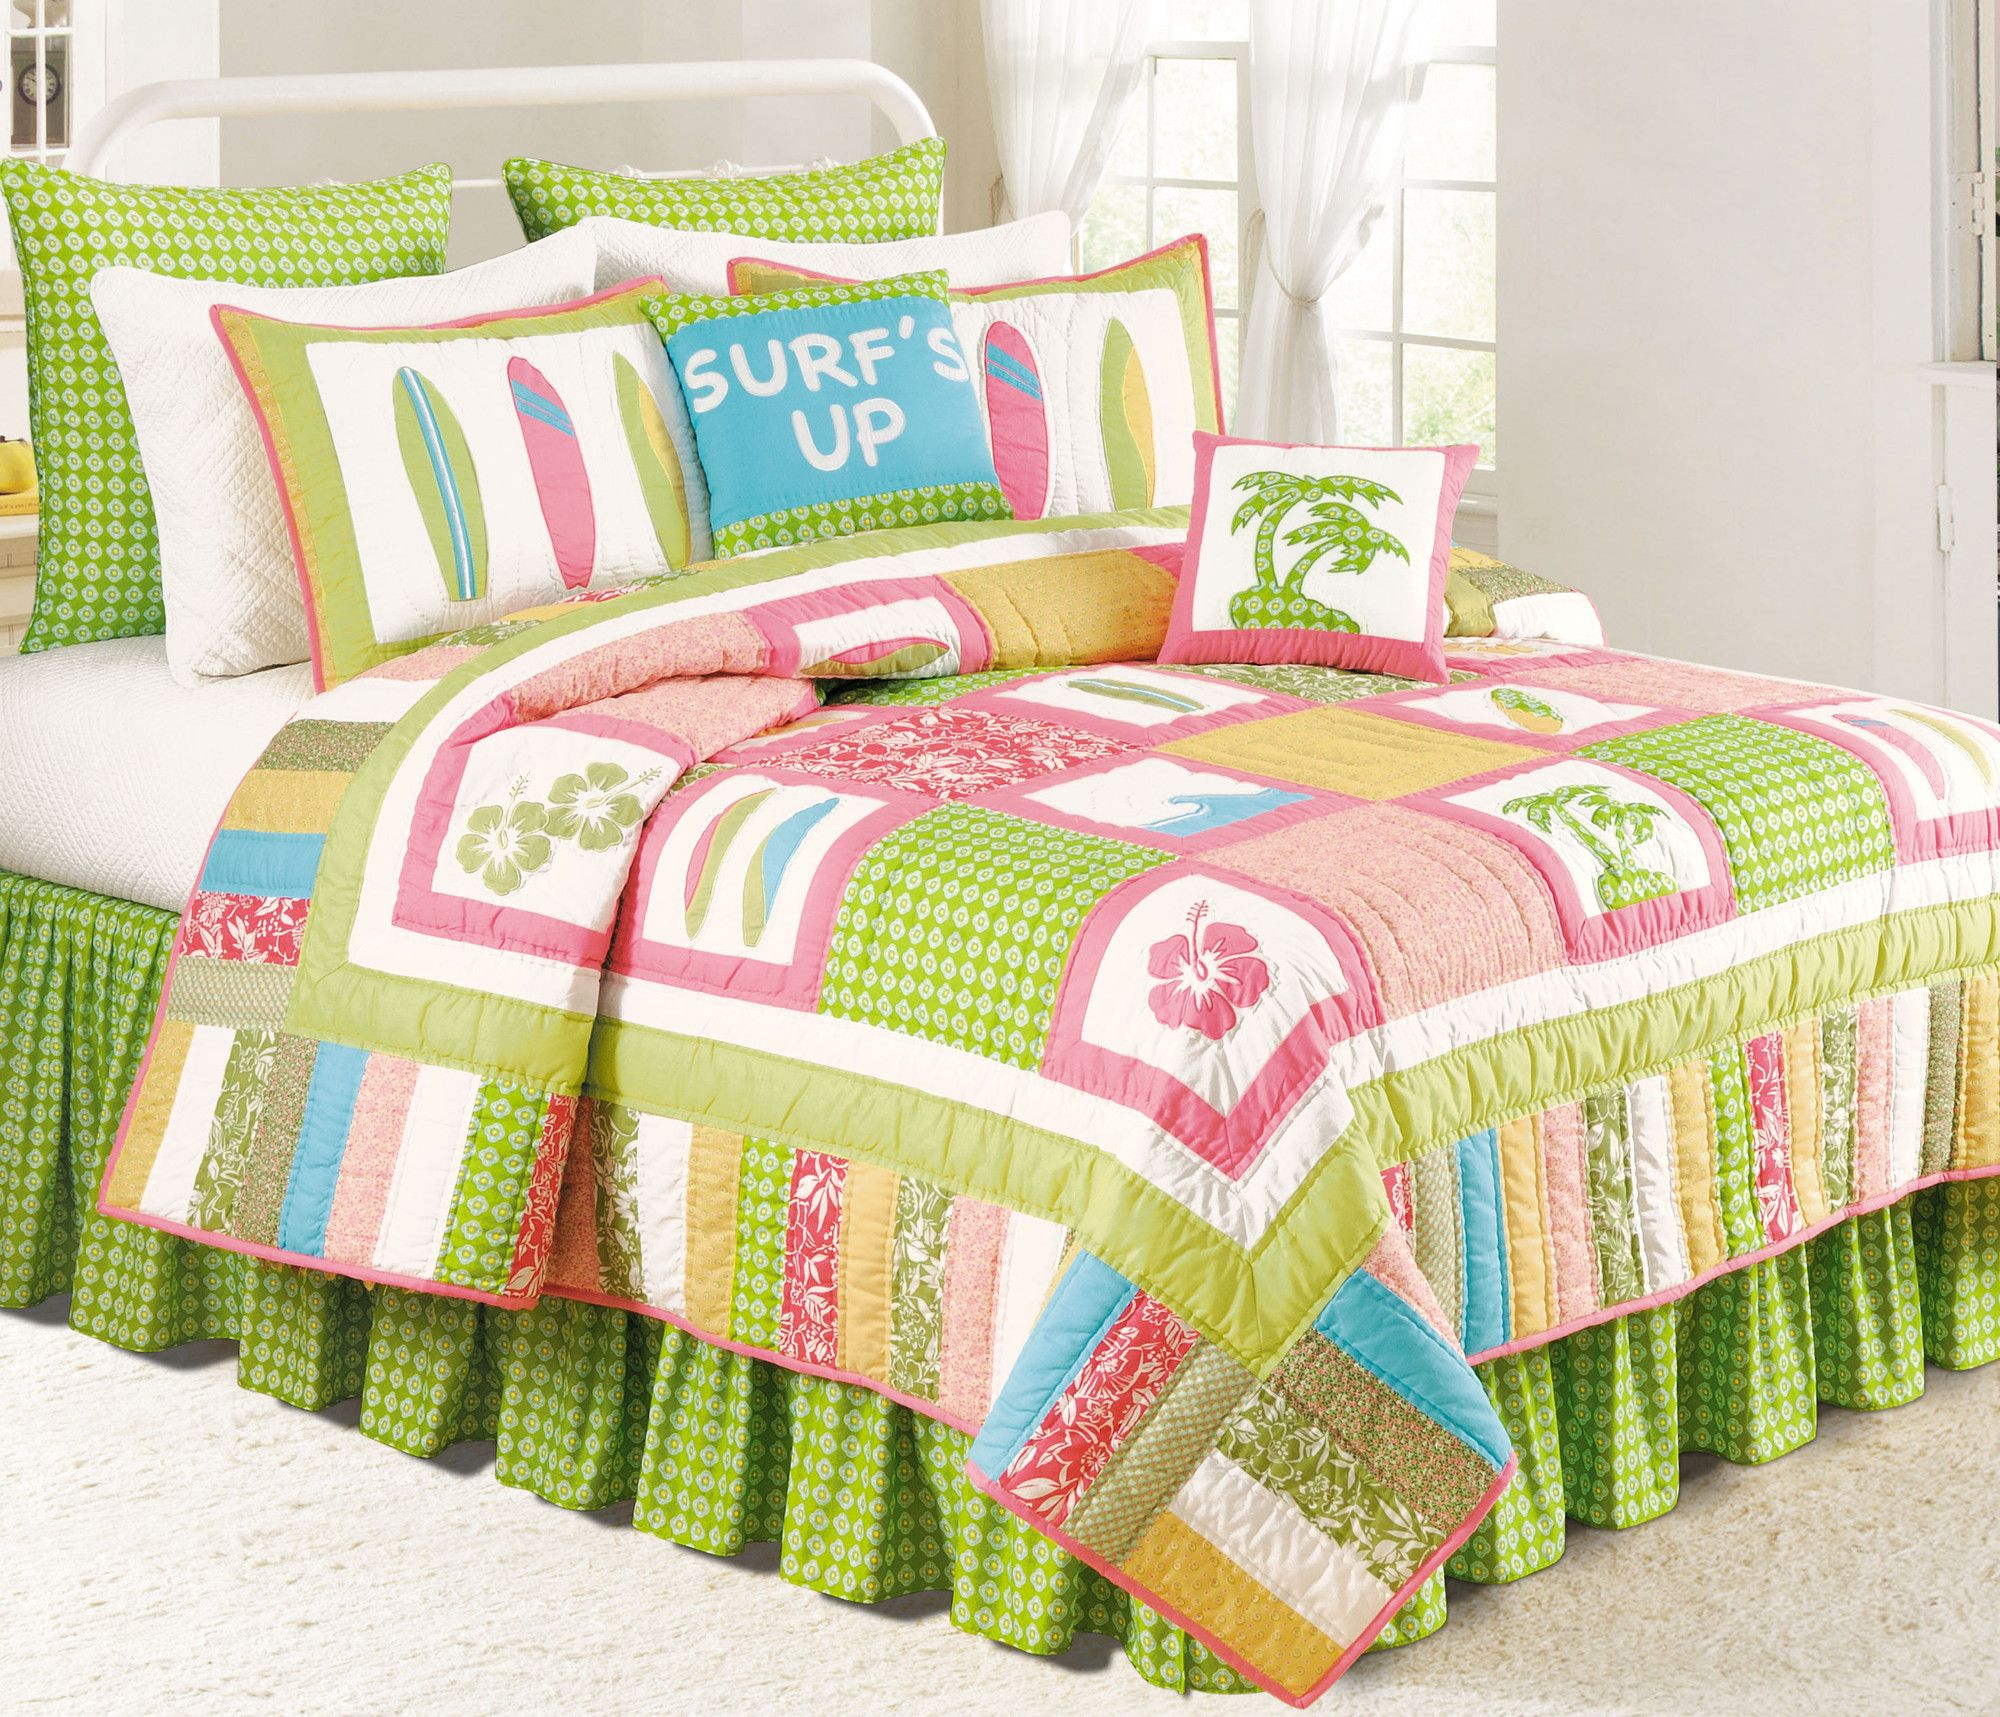 Decorating Kids Bedrooms Blogs | Beach bedding sets, Surf ...